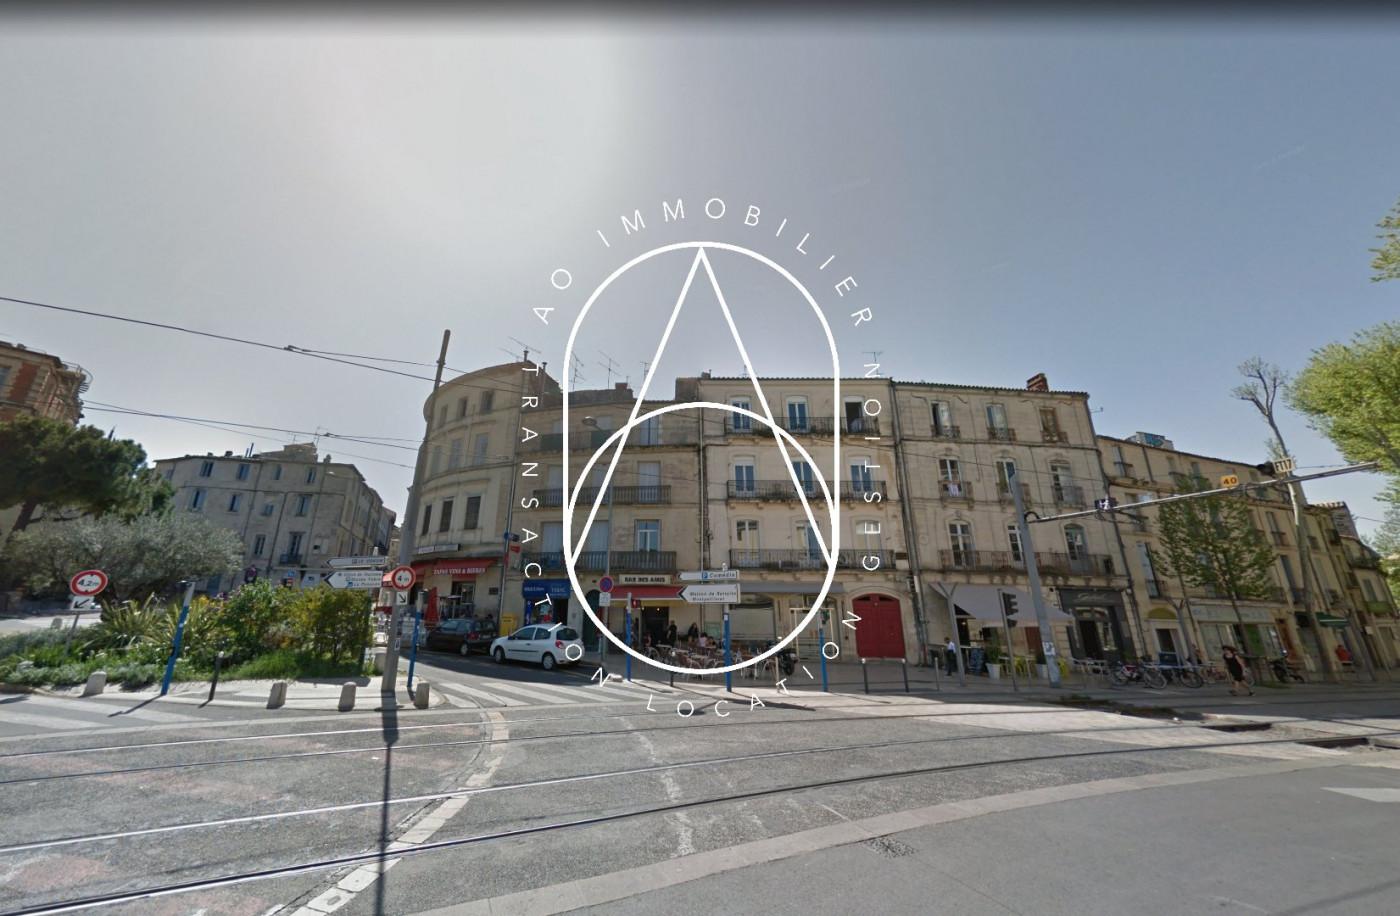 A vendre  Montpellier | Réf 34579713 - Ao immobilier